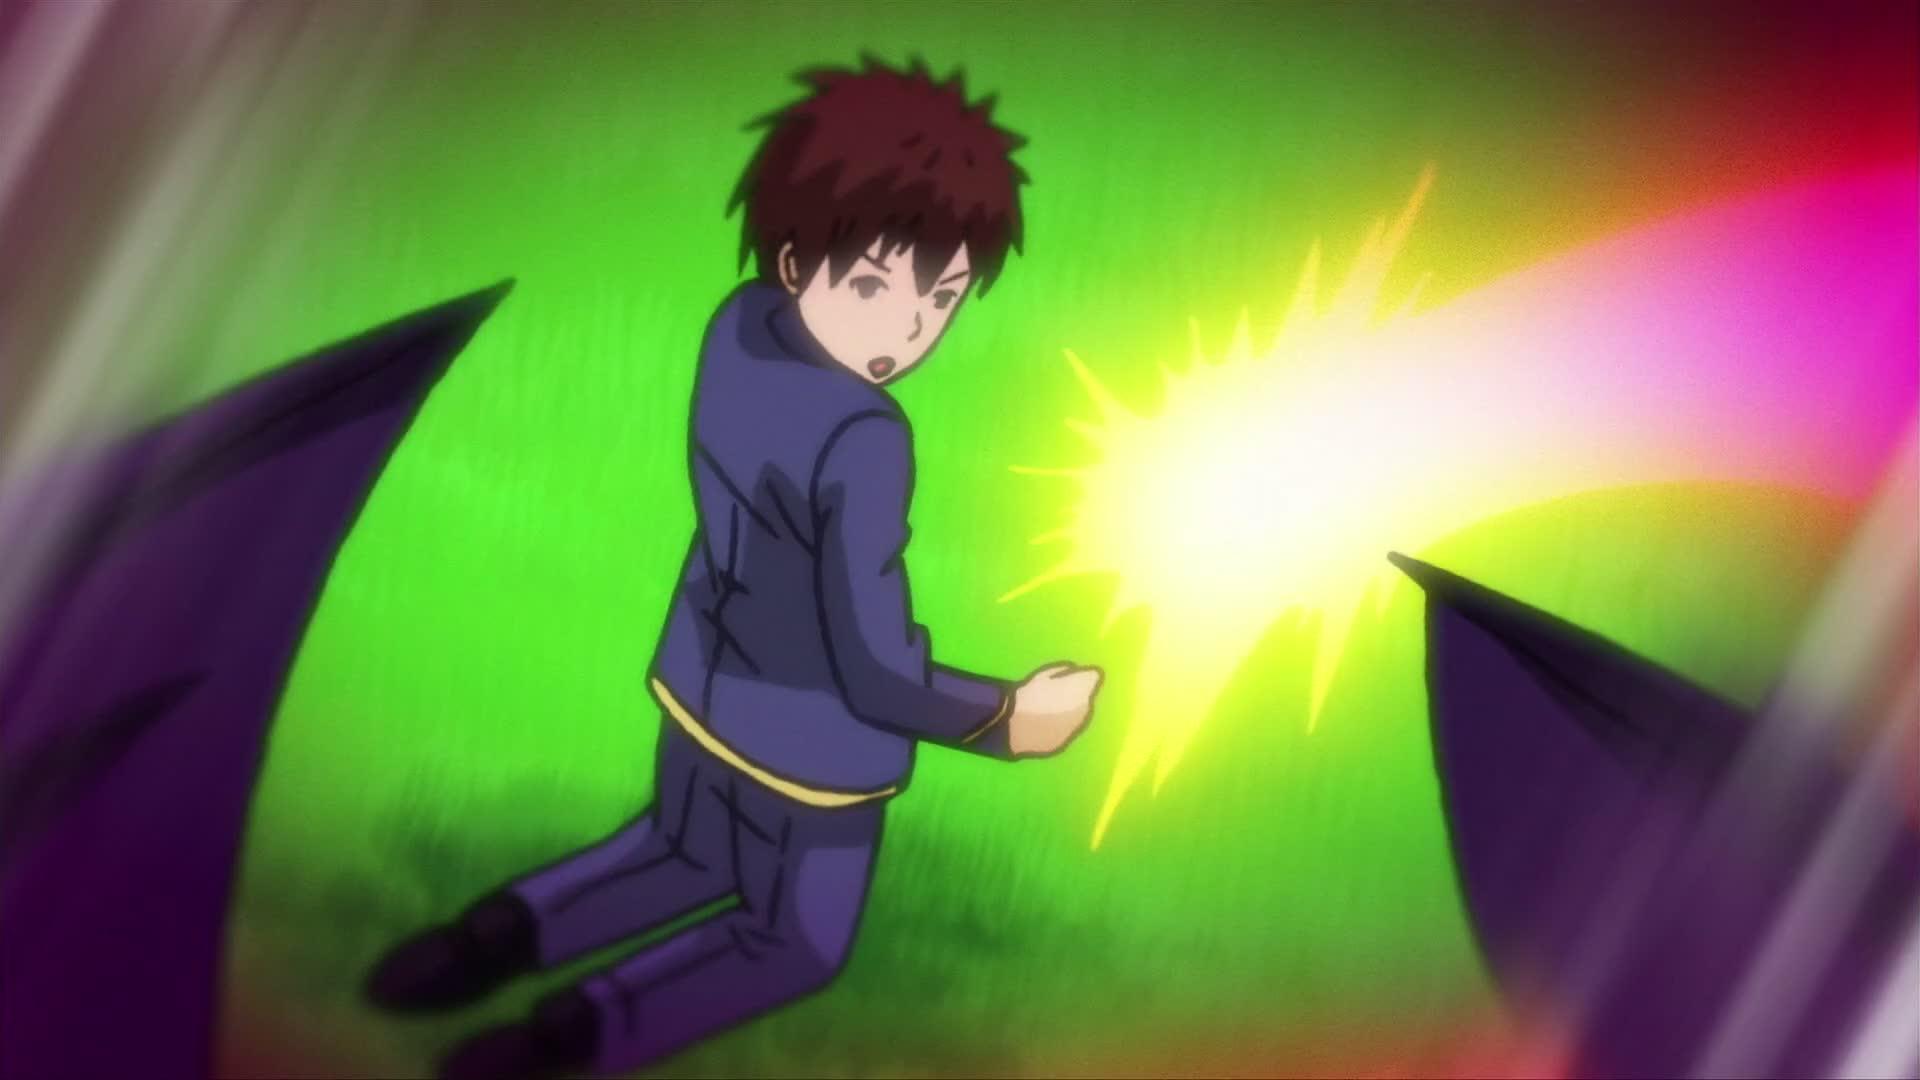 https://anime.h3dhub.com/videos/202006/09/5edeee300b079e794cb00ba3/0.jpg